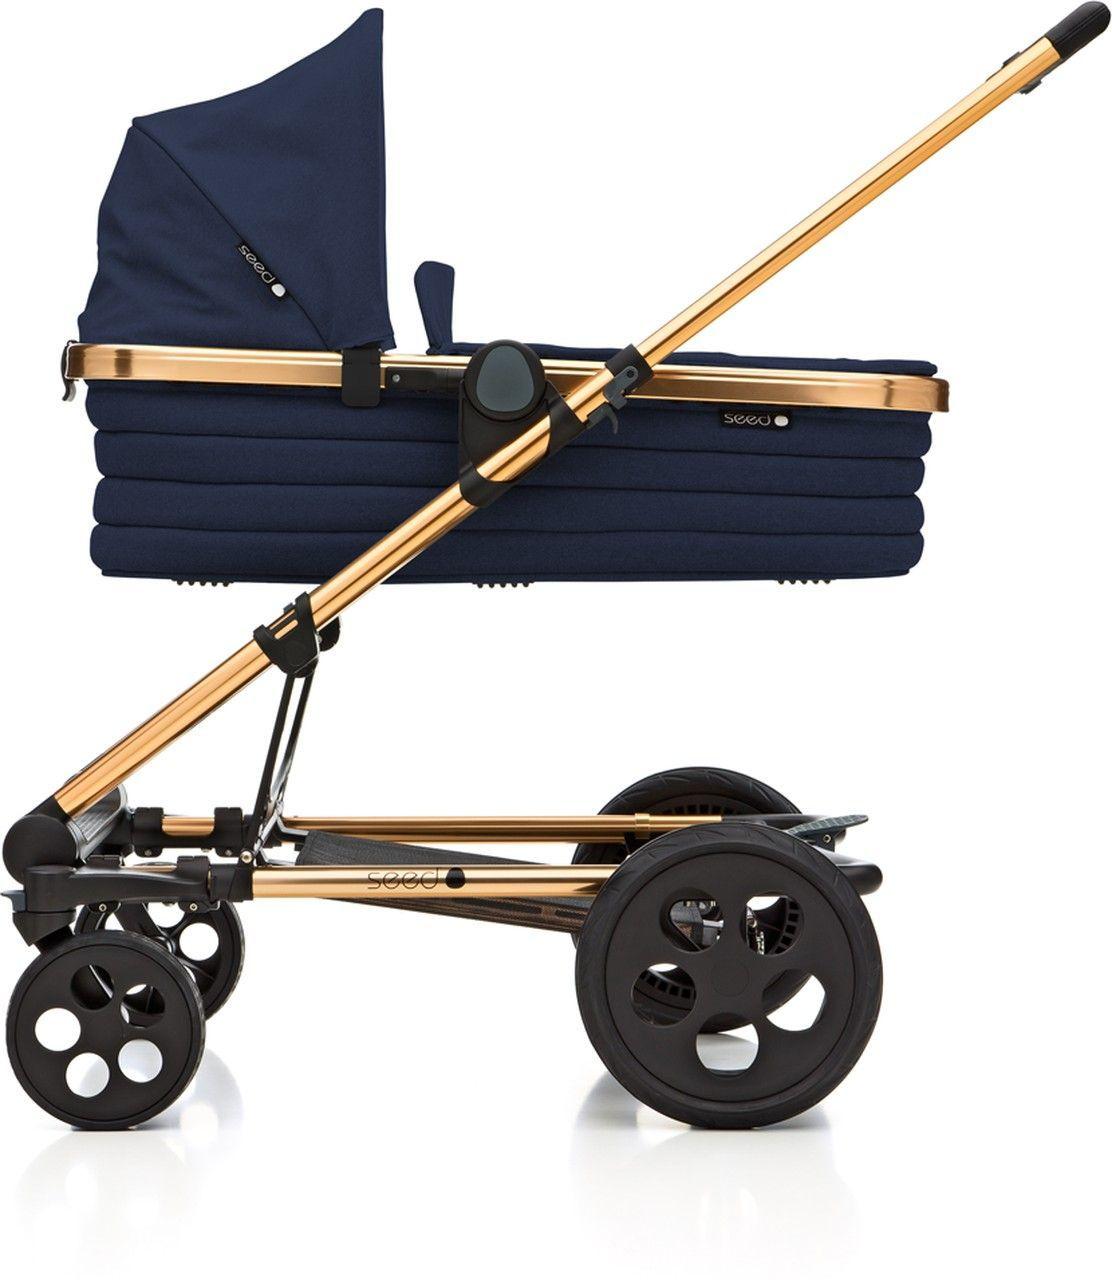 seed papilio kinderwagen set kupfer navy kleine fabriek. Black Bedroom Furniture Sets. Home Design Ideas